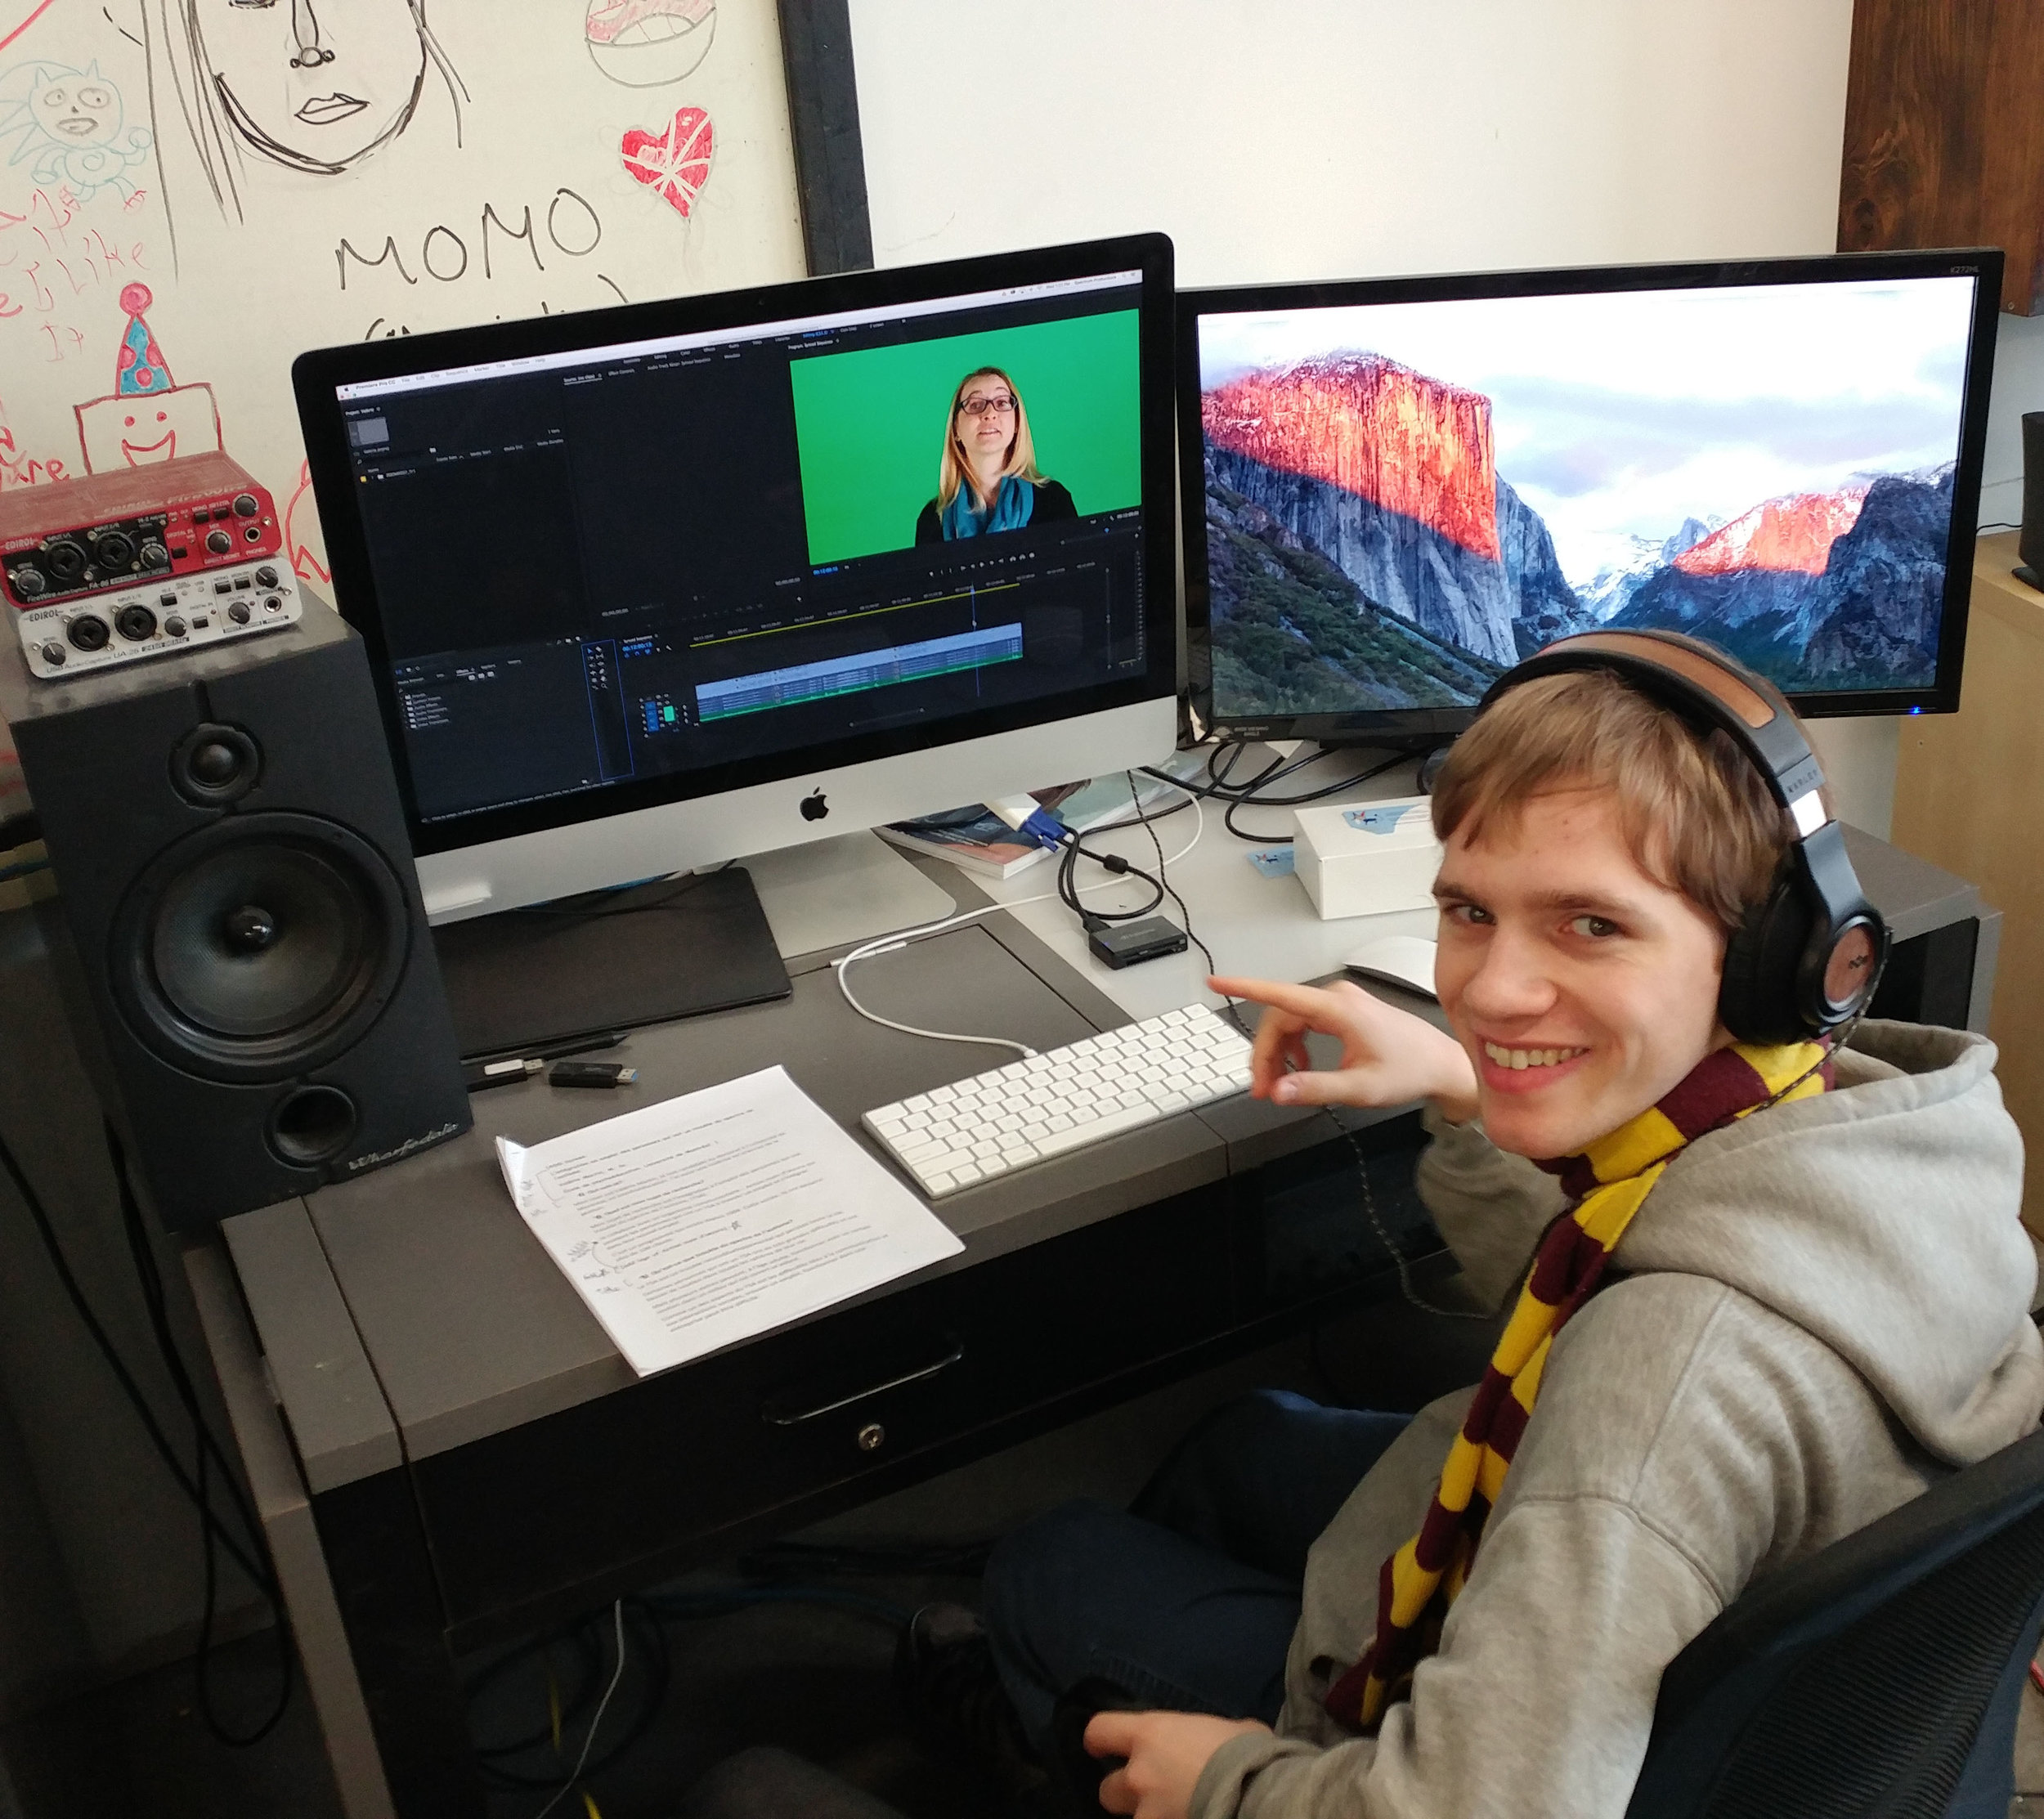 Christopher Dymond, Creative Media Lab